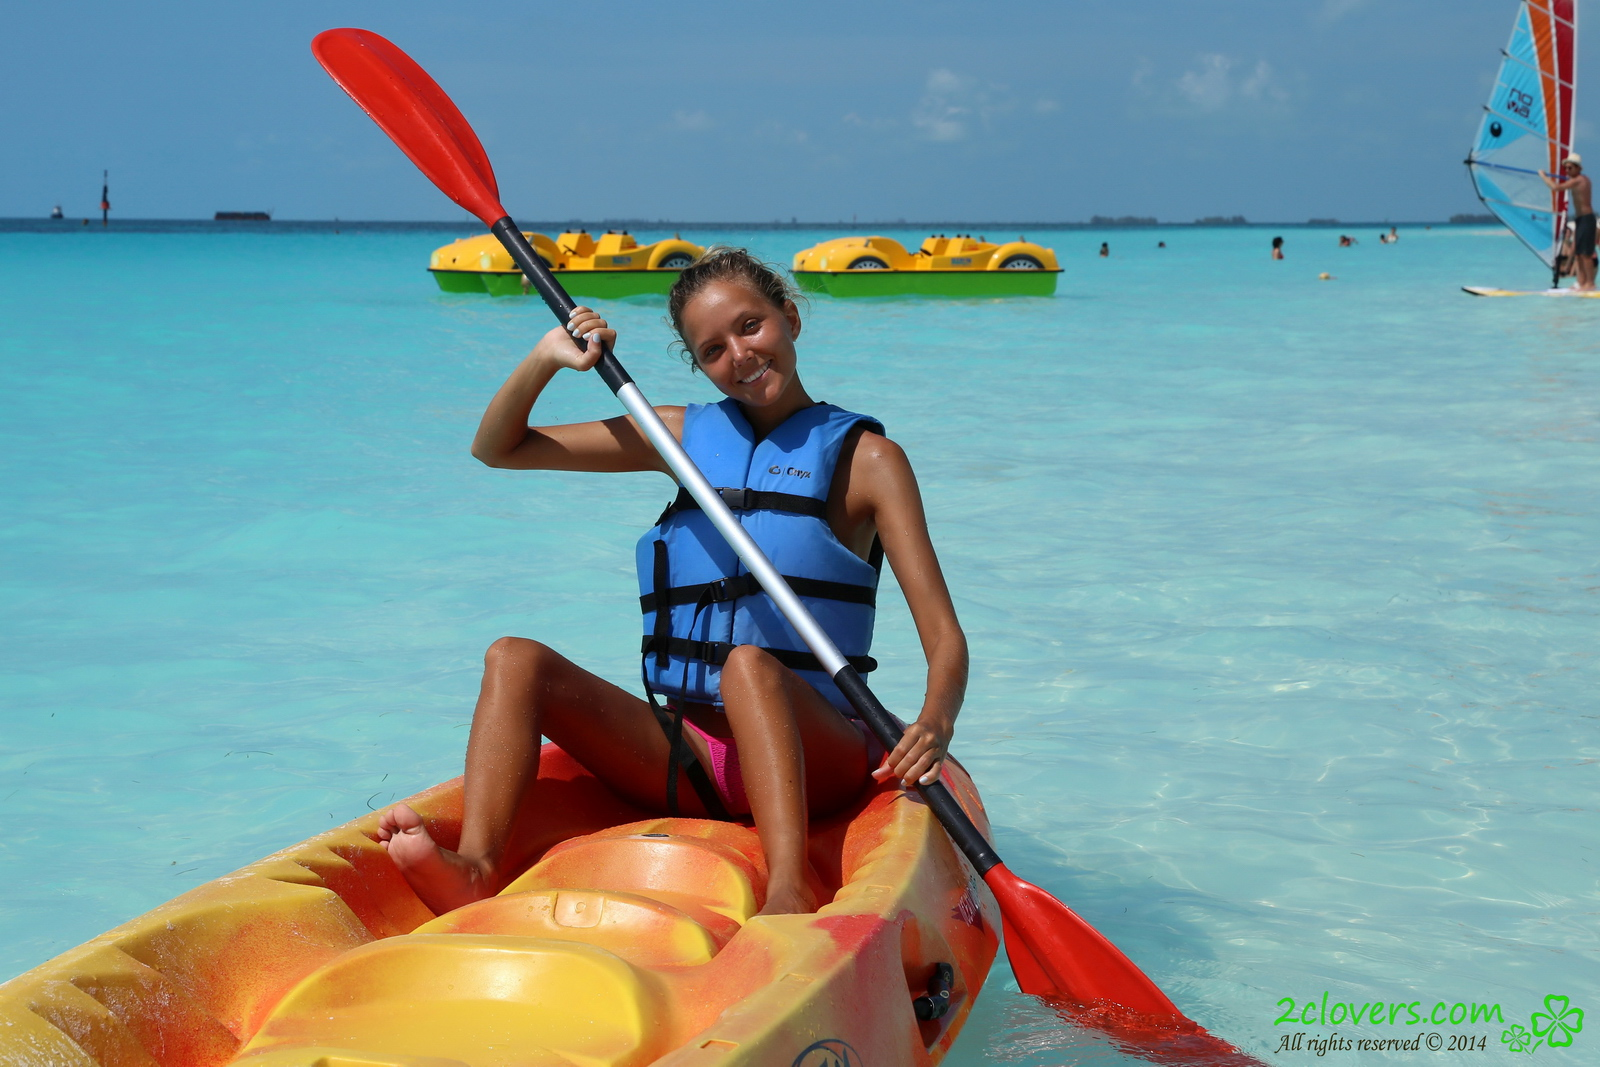 katya-clover-naked-on-sirena-beach-seaside-2clovers-03